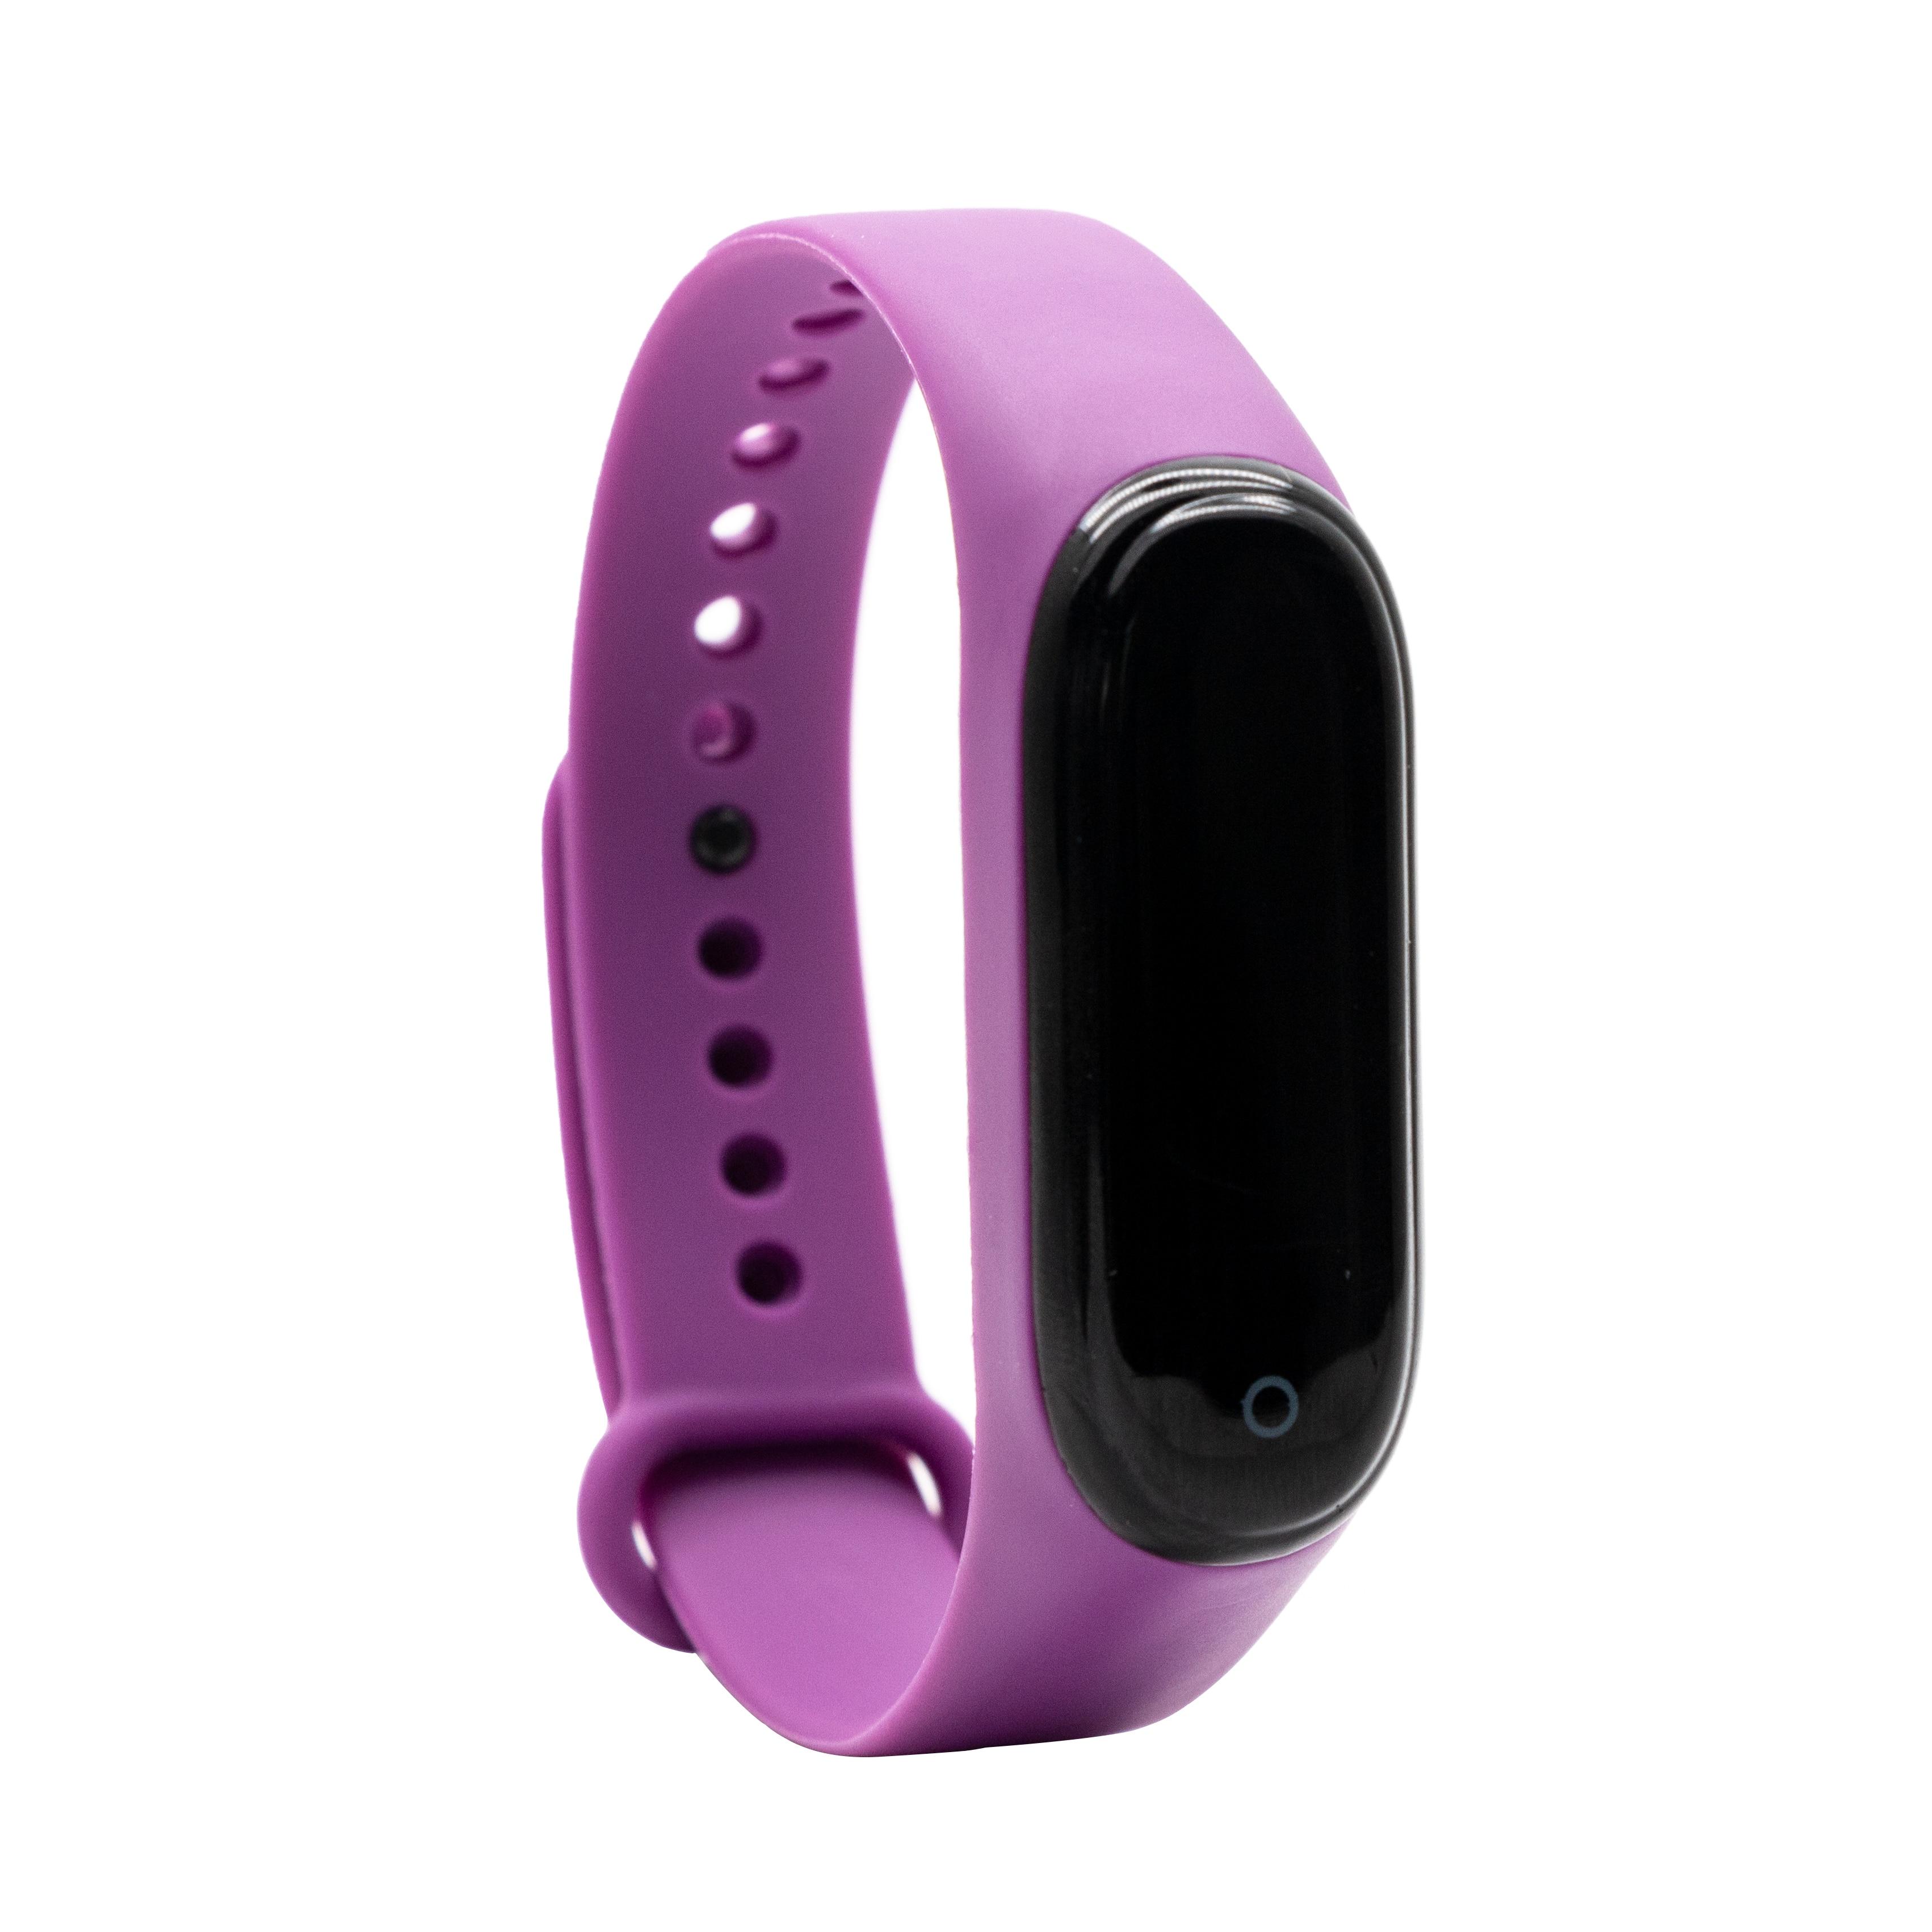 Smart Wearable Watch for Women Men with Color Screen Waterproof Running Pedometer Calorie Counter Health Sport Activity Tracker 5